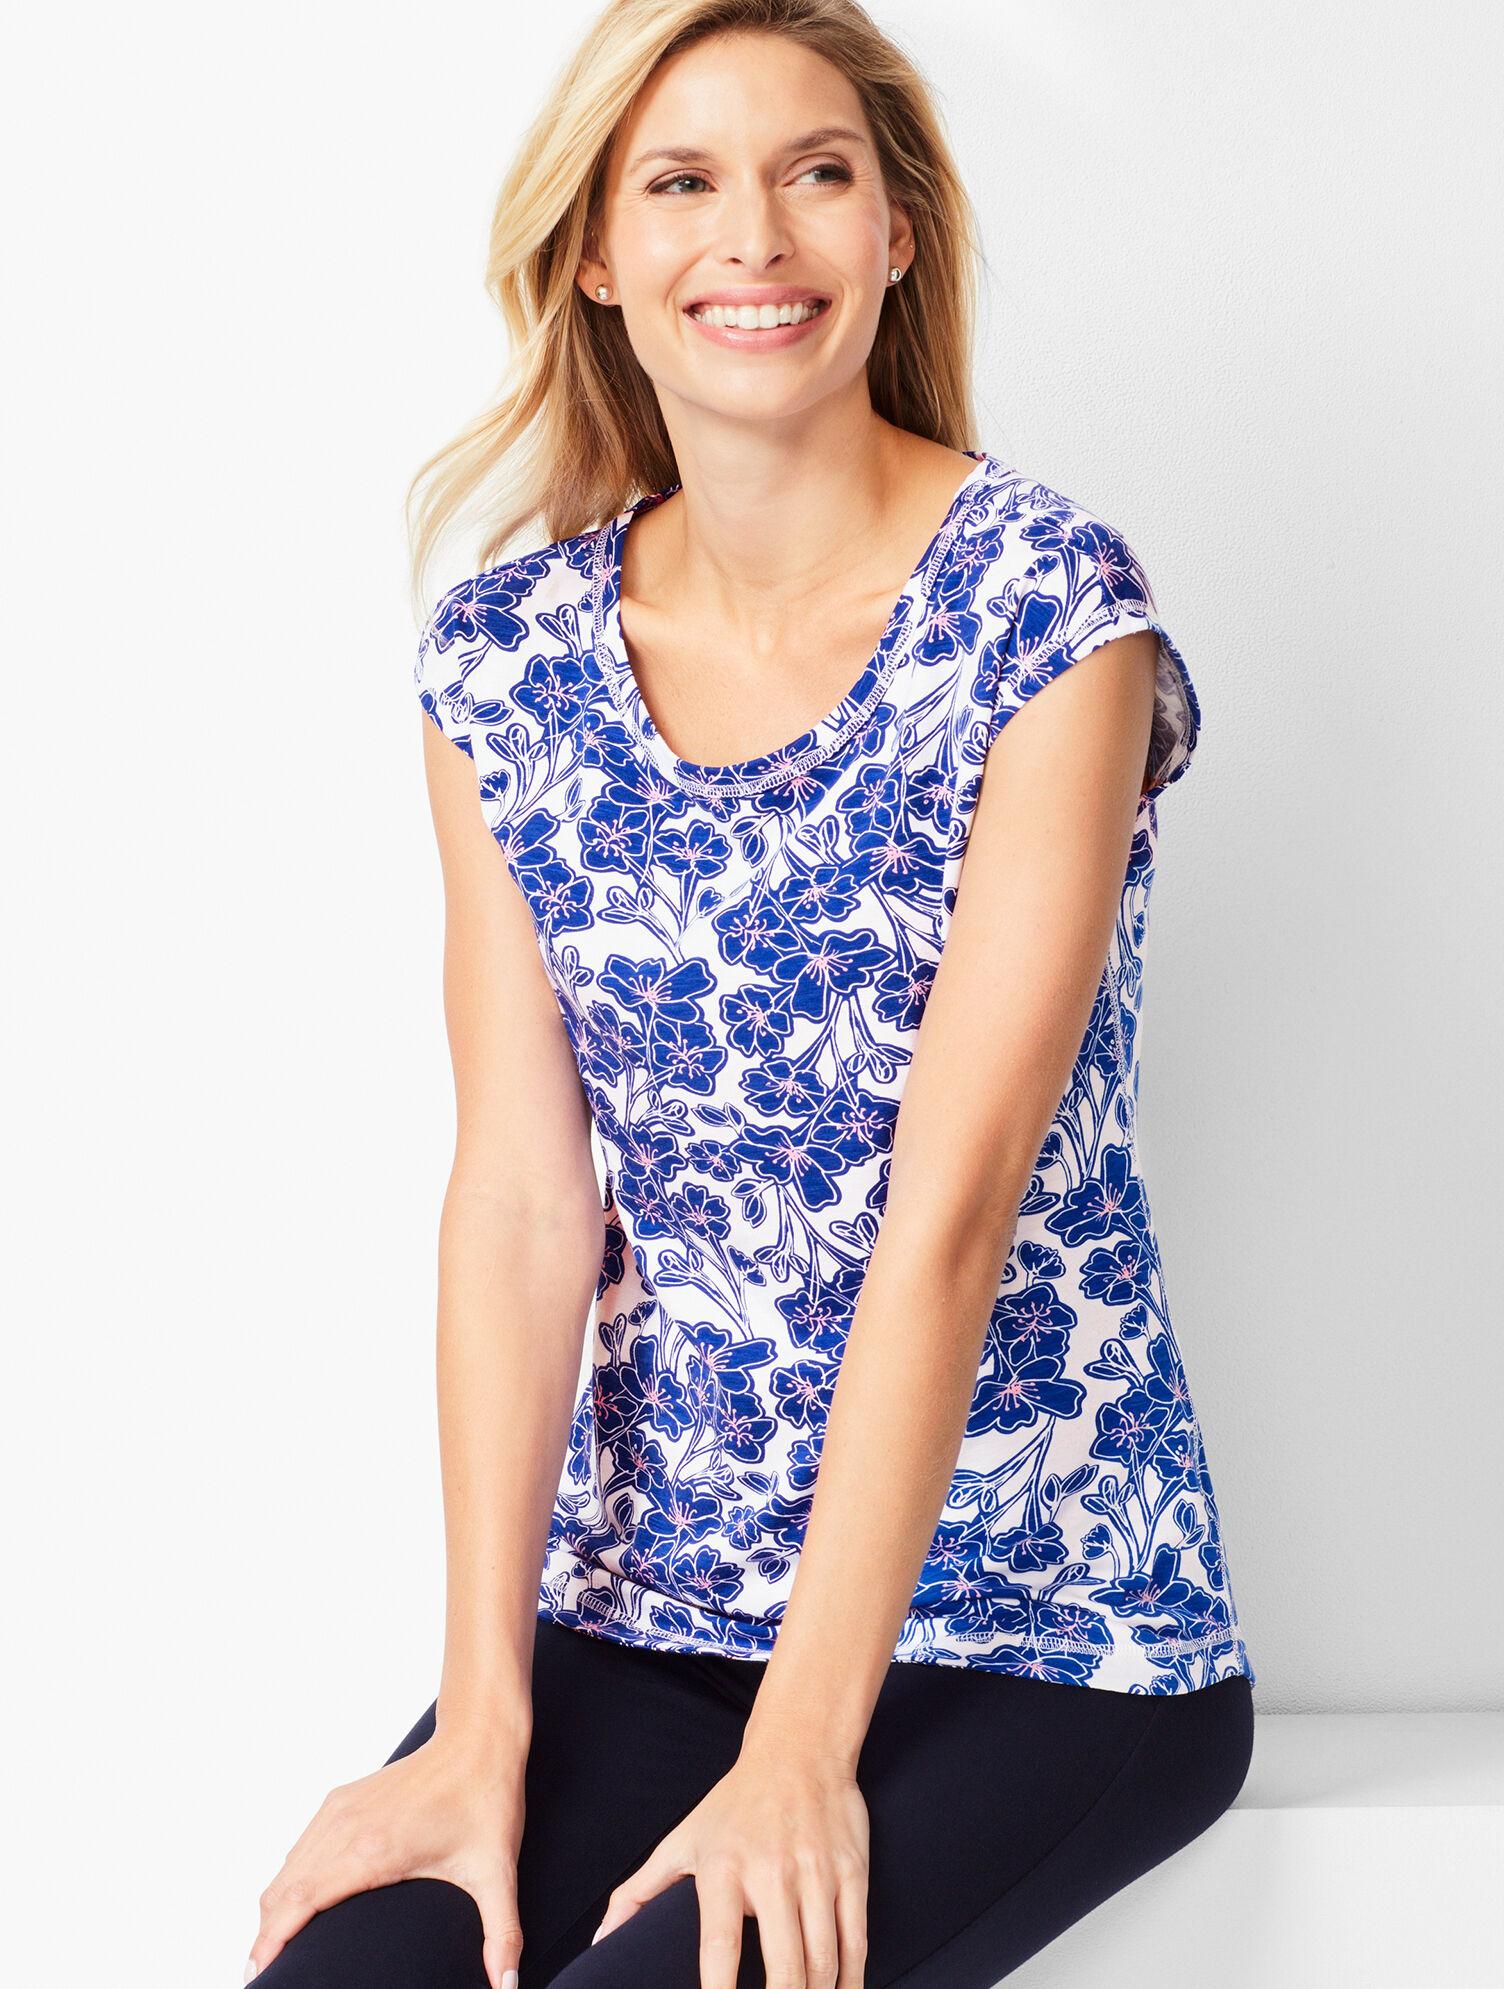 Talbots Floral Skirt Cotton Blend Multi-color Straight White Blue Size 4 Petite Women's Clothing